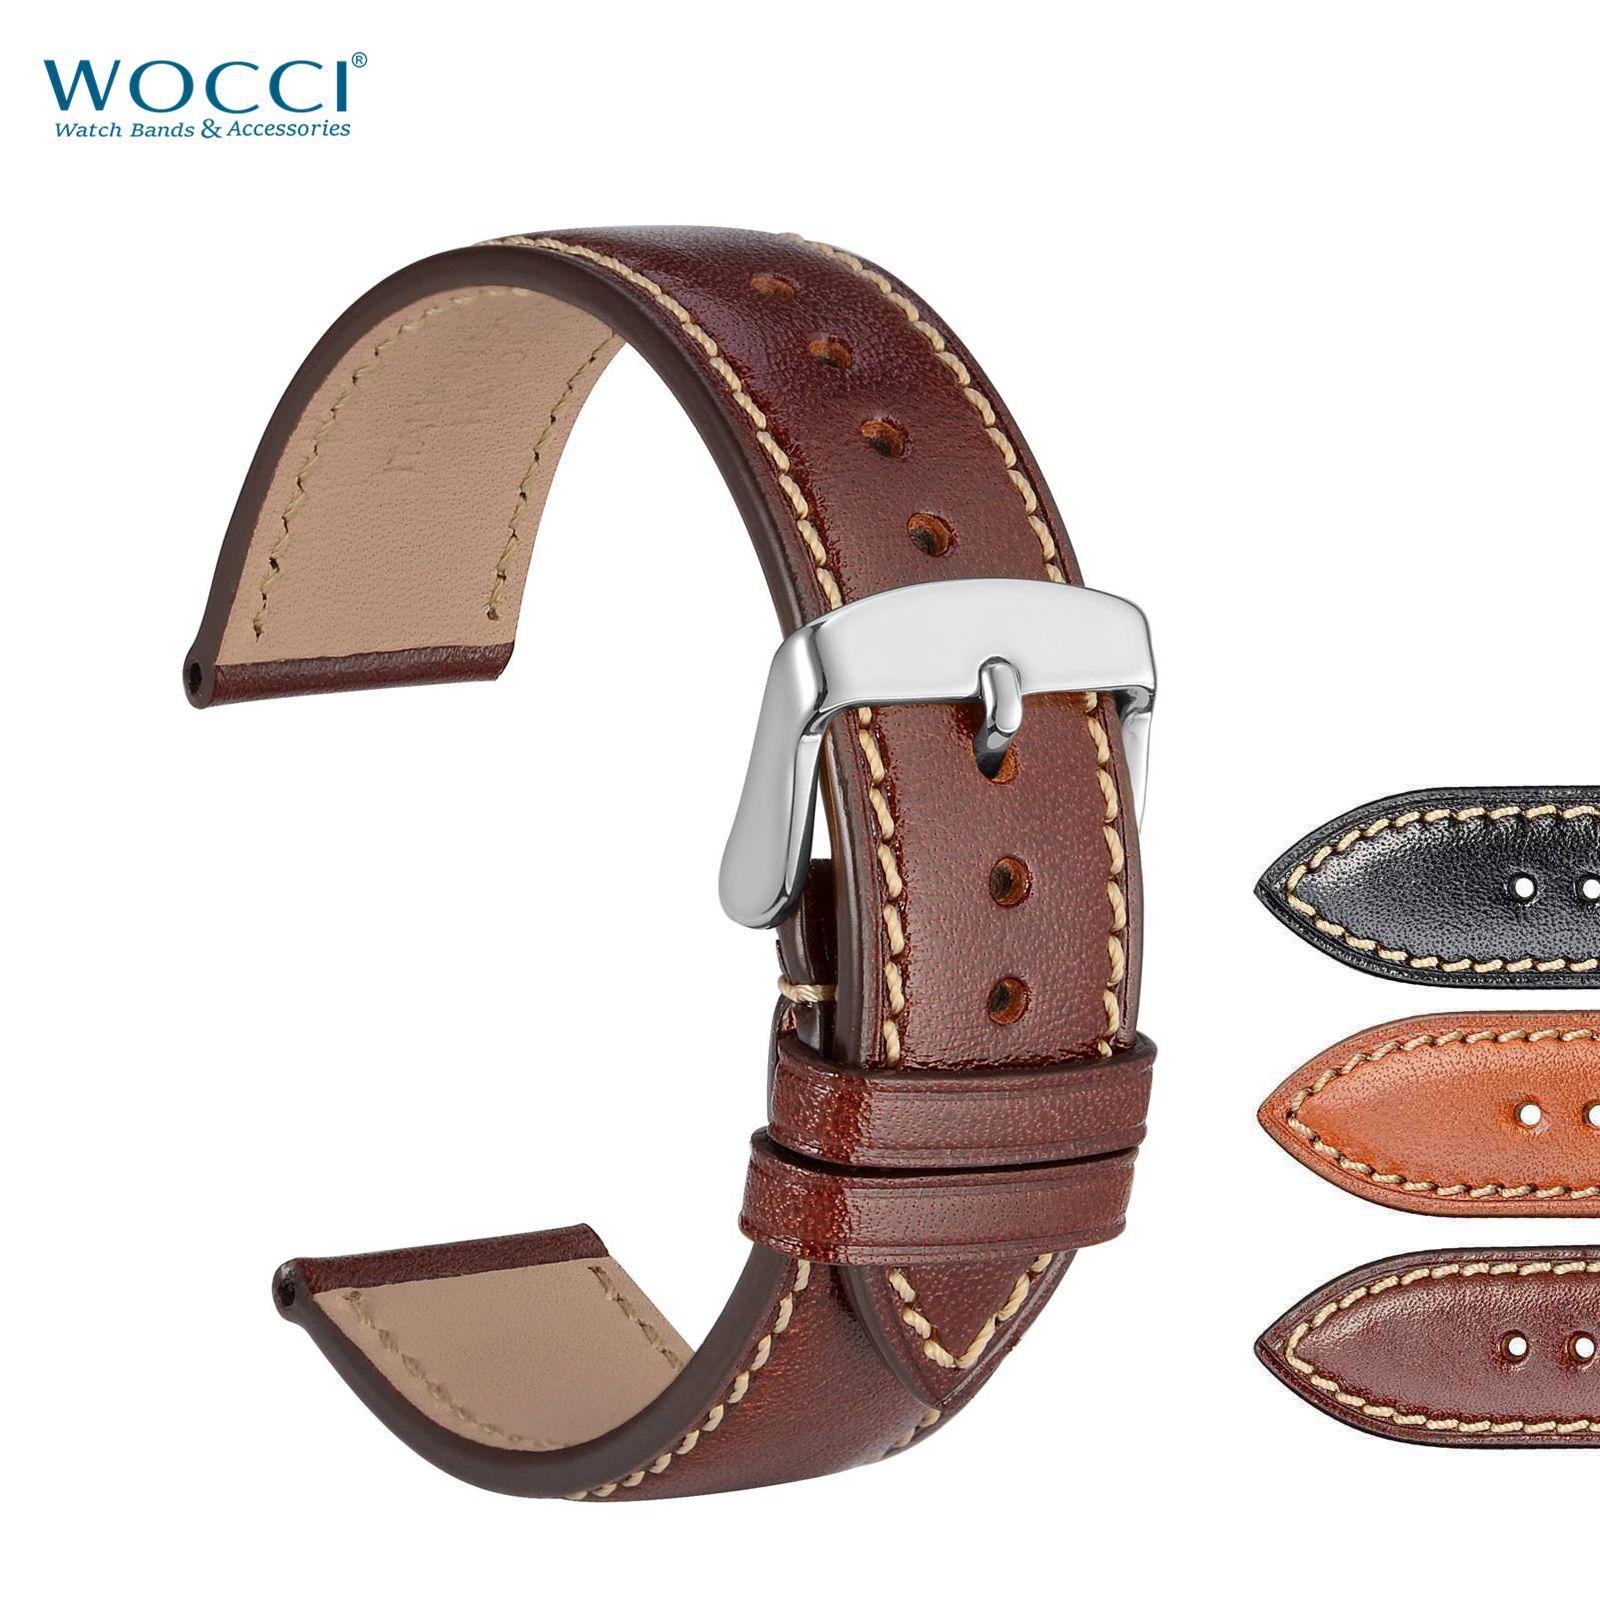 WOCCI italiana capa superior de piel de becerro correas de reloj de pulsera para hombres banda de reloj de la correa de las mujeres anchura de la pulsera 22m 18mm 20mm